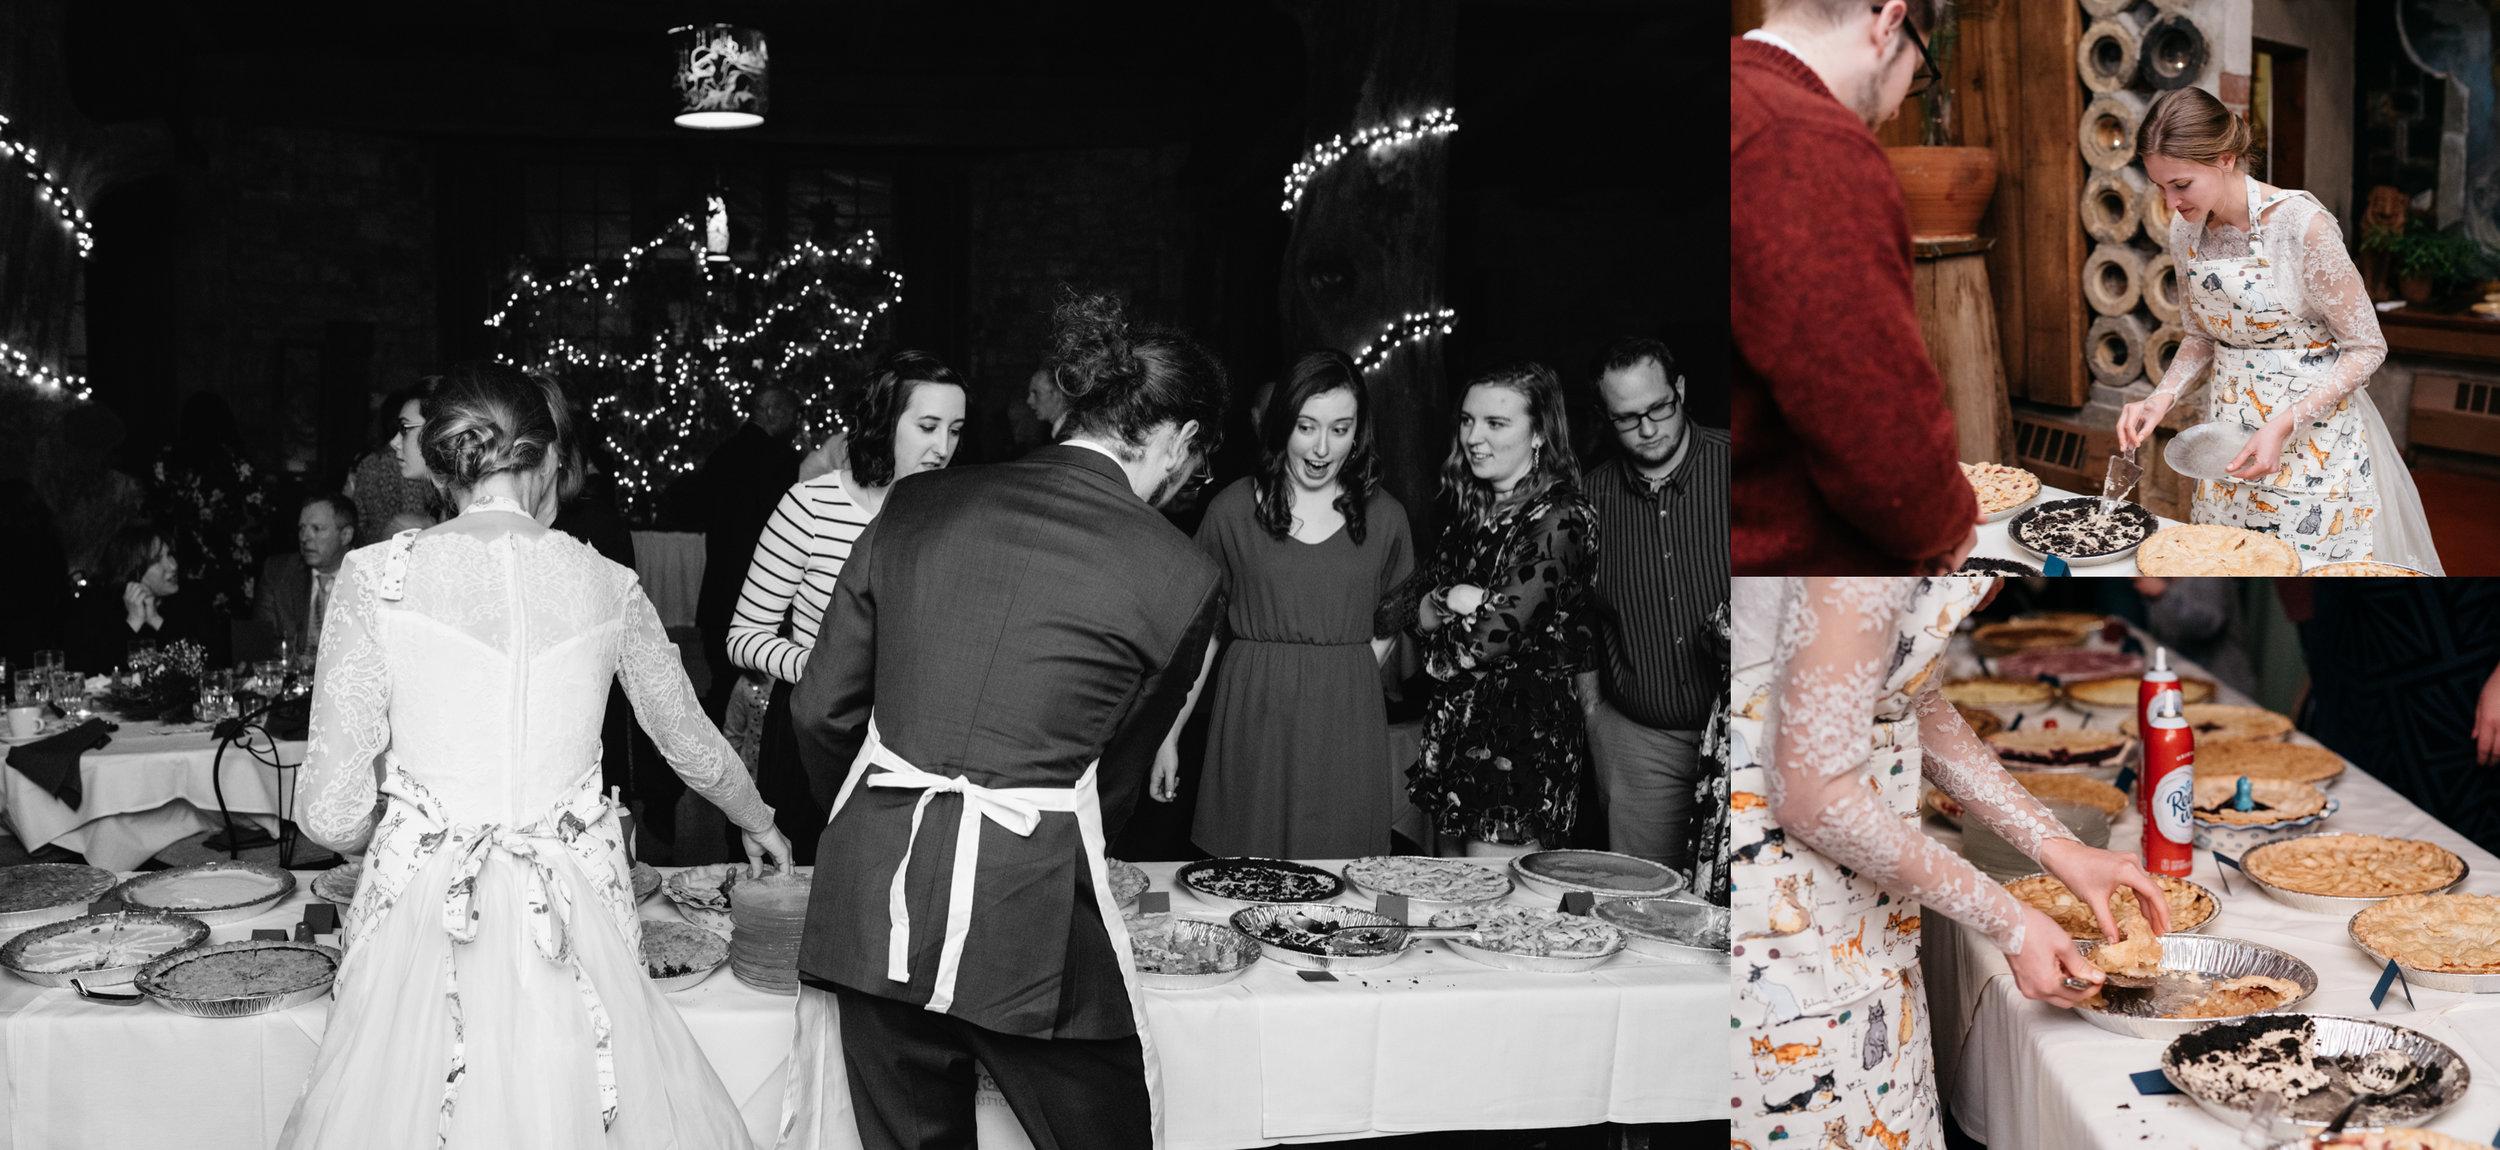 Pie Serving Green Gables Wedding Photographer, Mariah Fisher.jpg